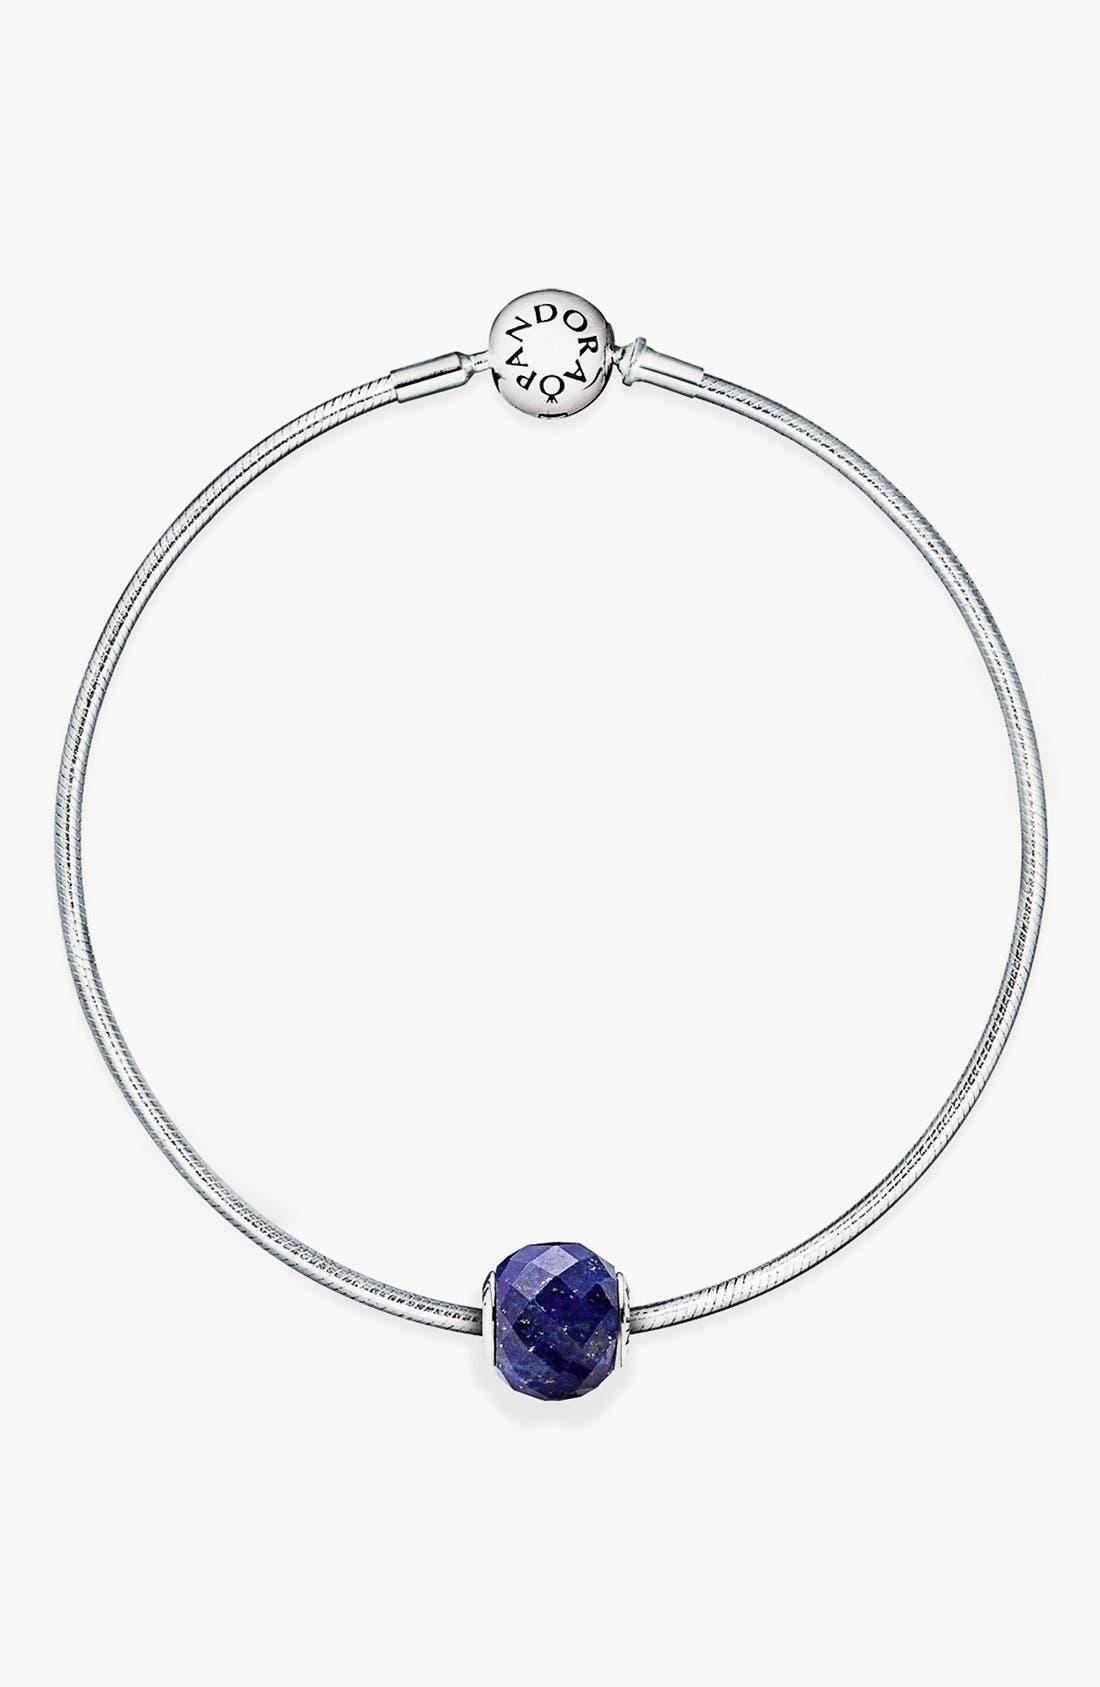 Main Image - PANDORA 'Essence - Peace' Charm Bracelet Set